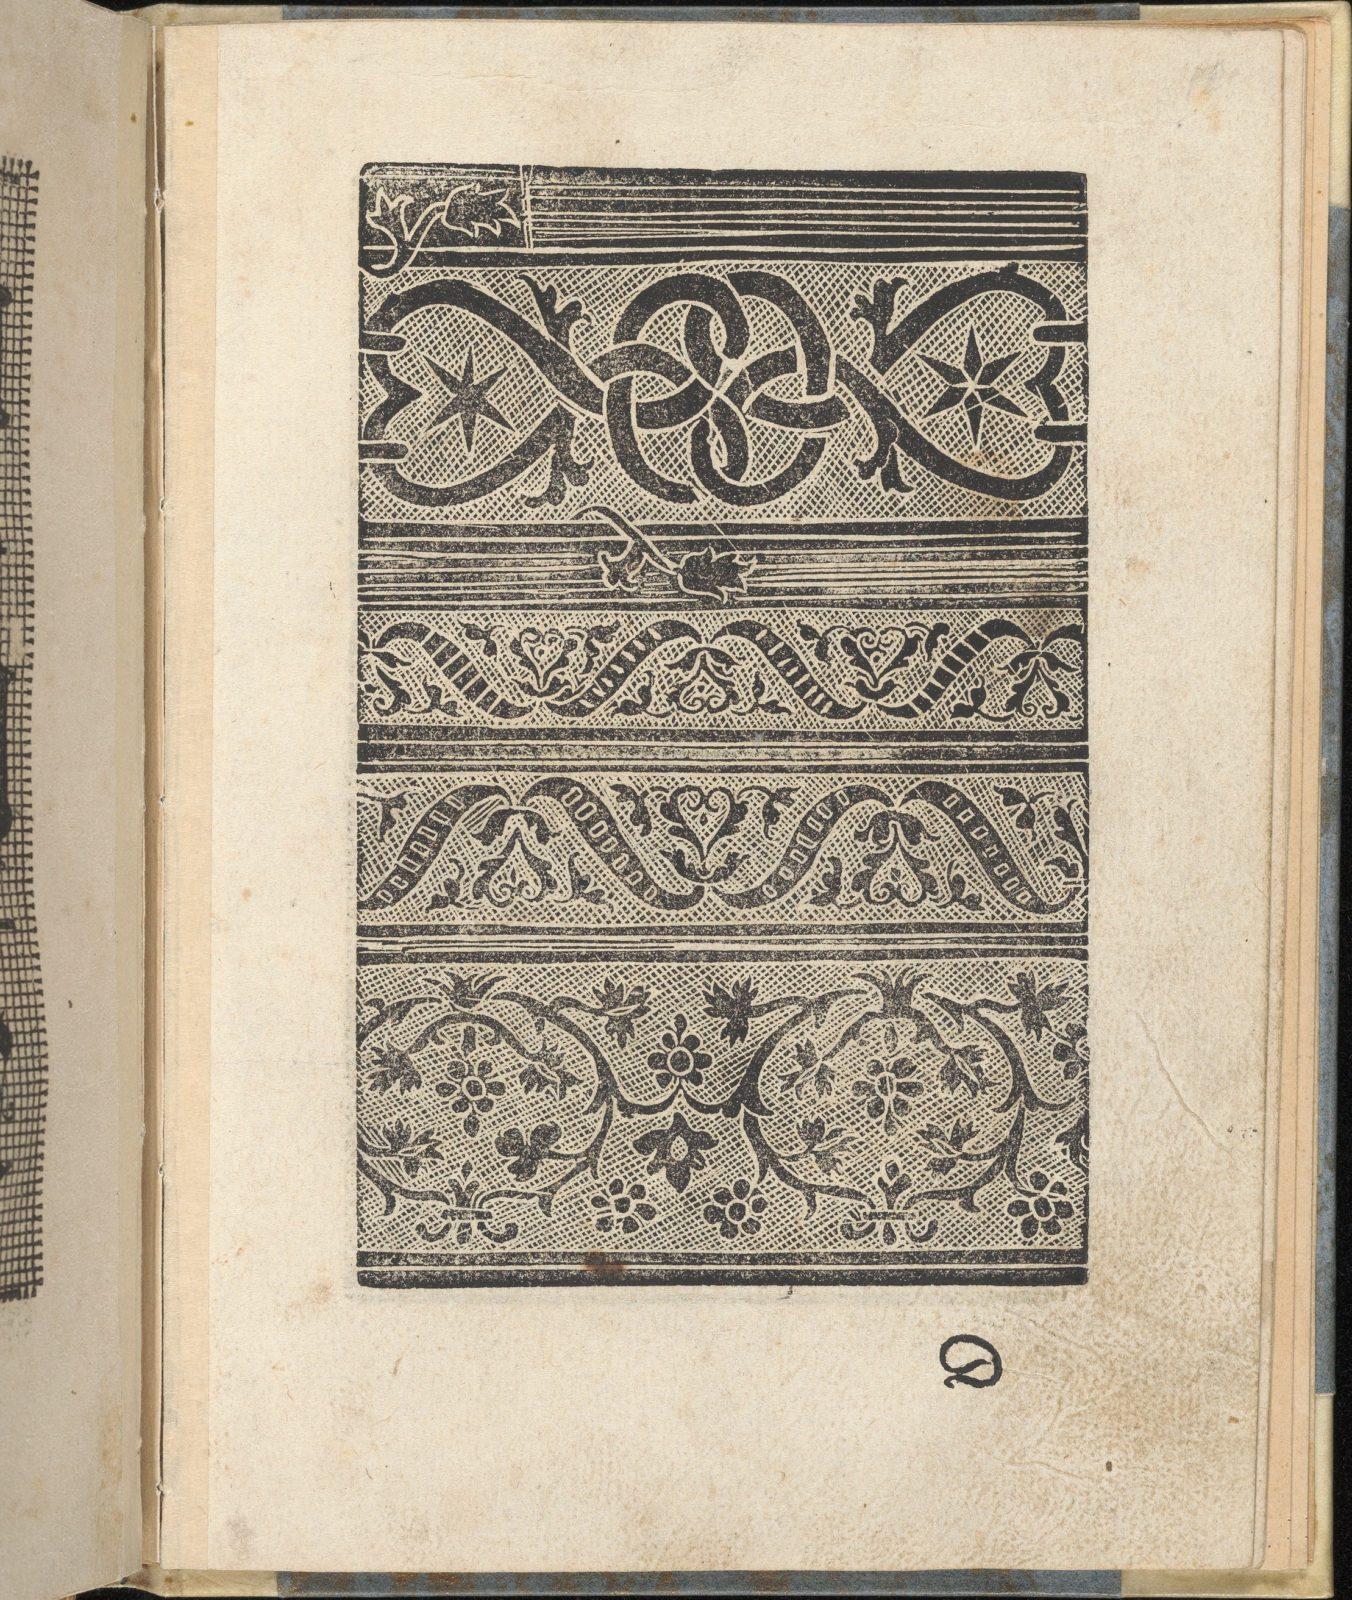 Ein ney Furmbüchlein, Page 11, recto